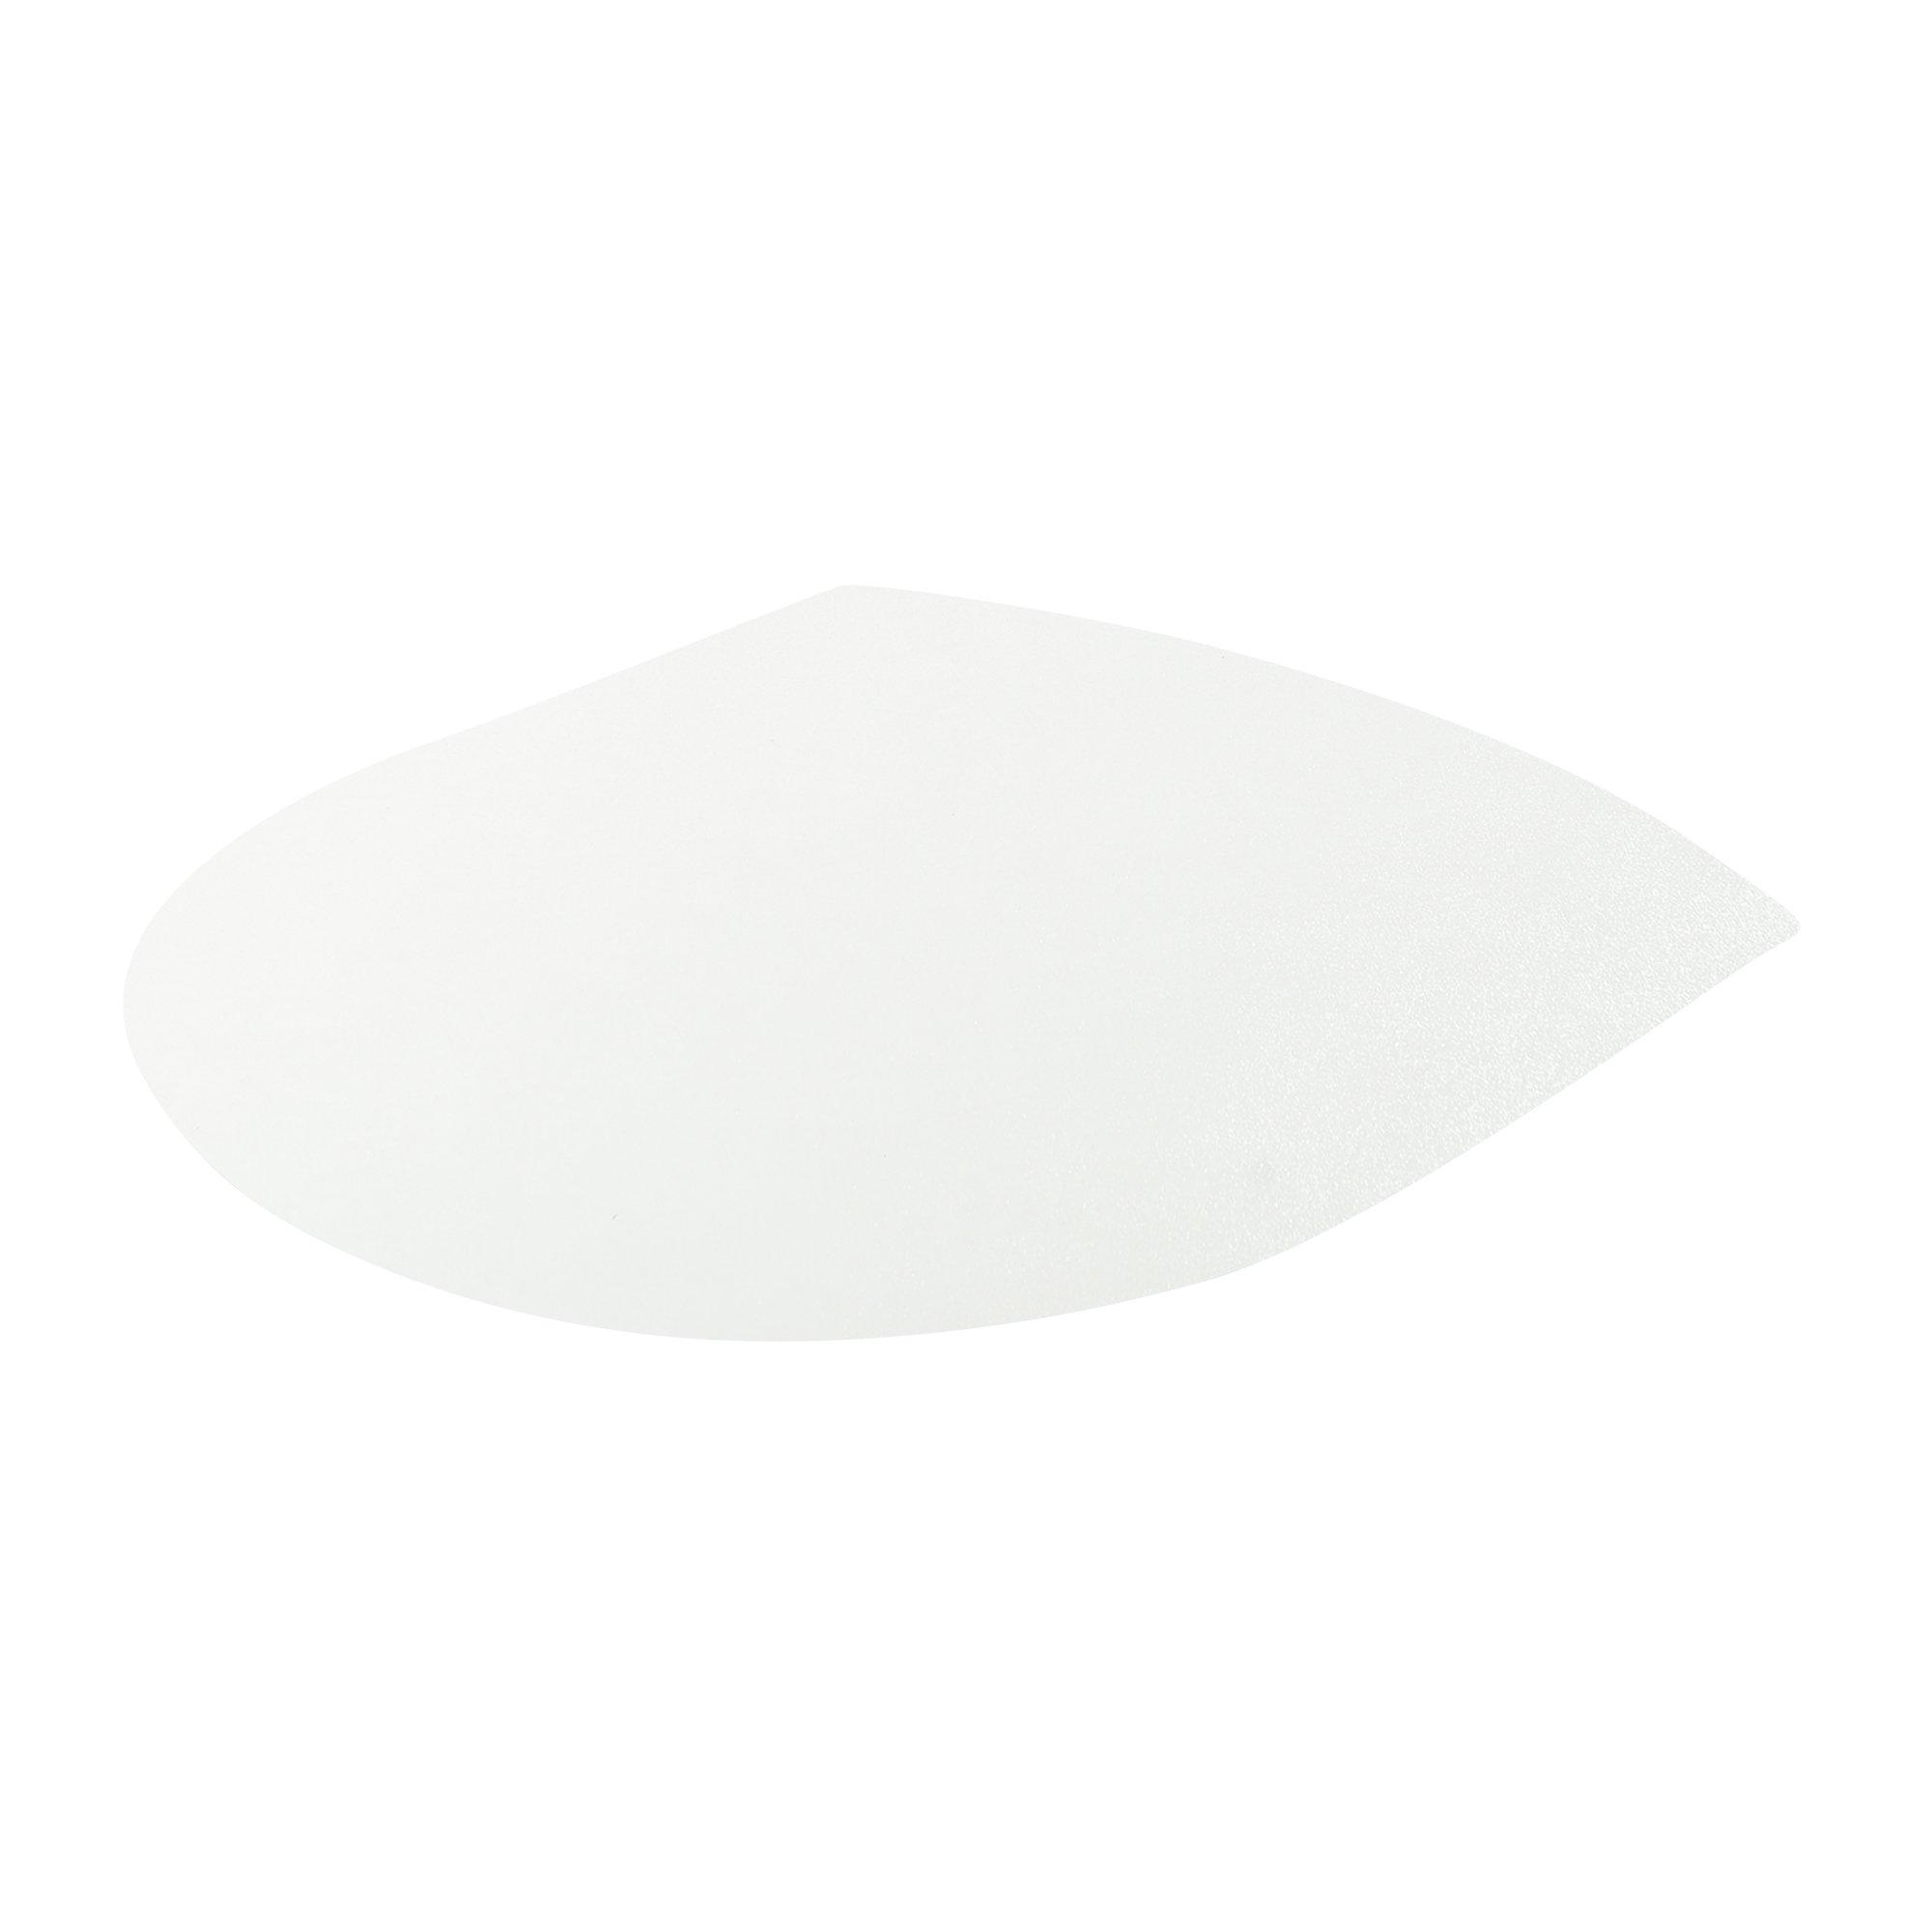 Deflecto EconoMat Clear Chair Mat, Hard Floor Use, Contour, Straight Edge, 48 x 56 Inches (CM21092I)